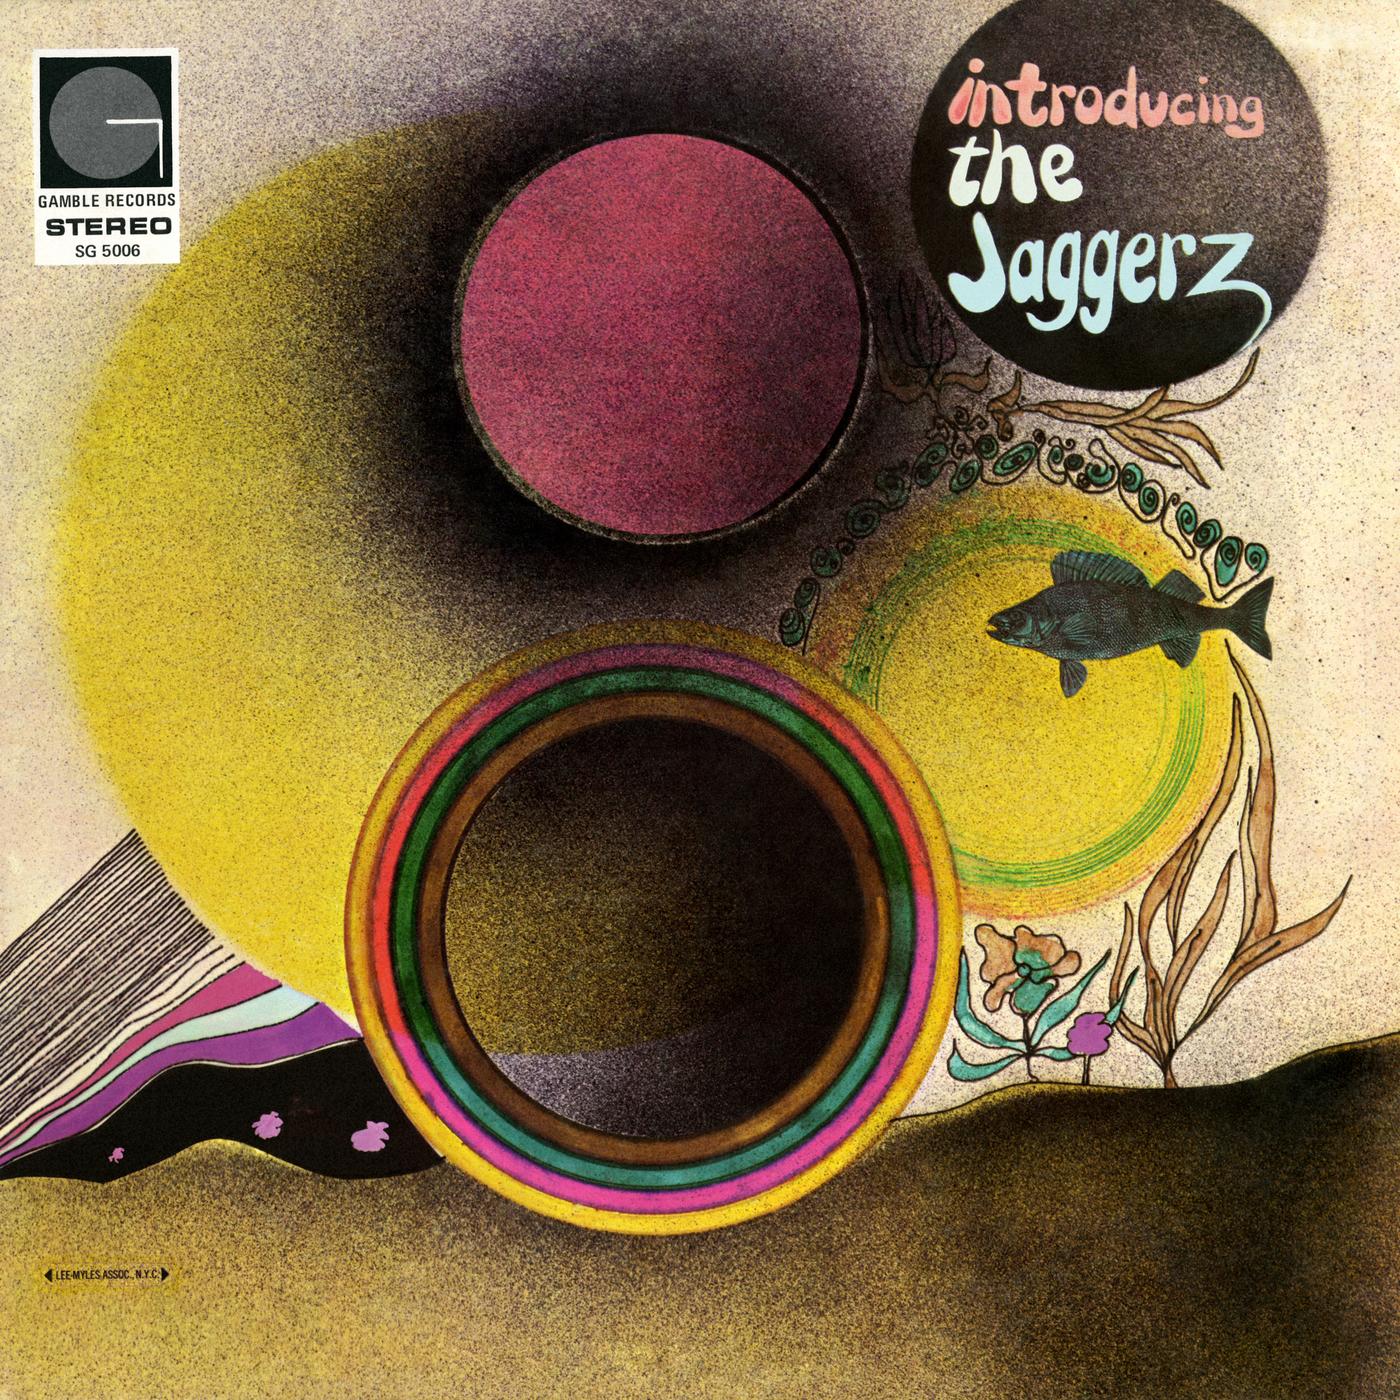 Introducing The Jaggerz - The Jaggerz